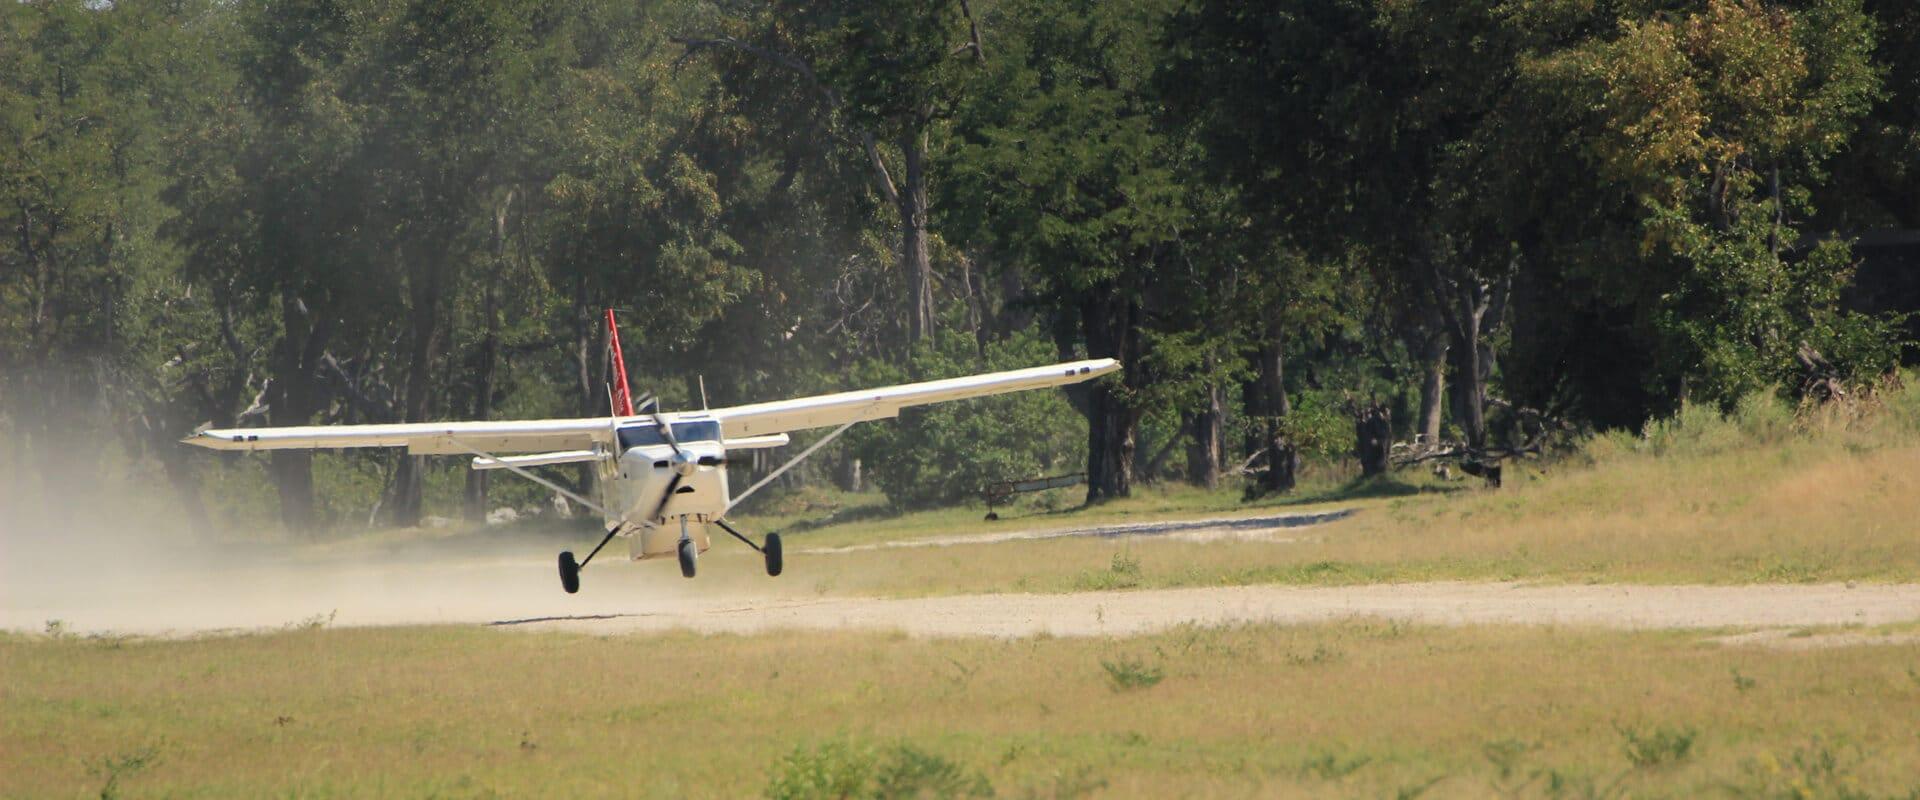 fly-in-safari-botswana-moremi-game-reserve